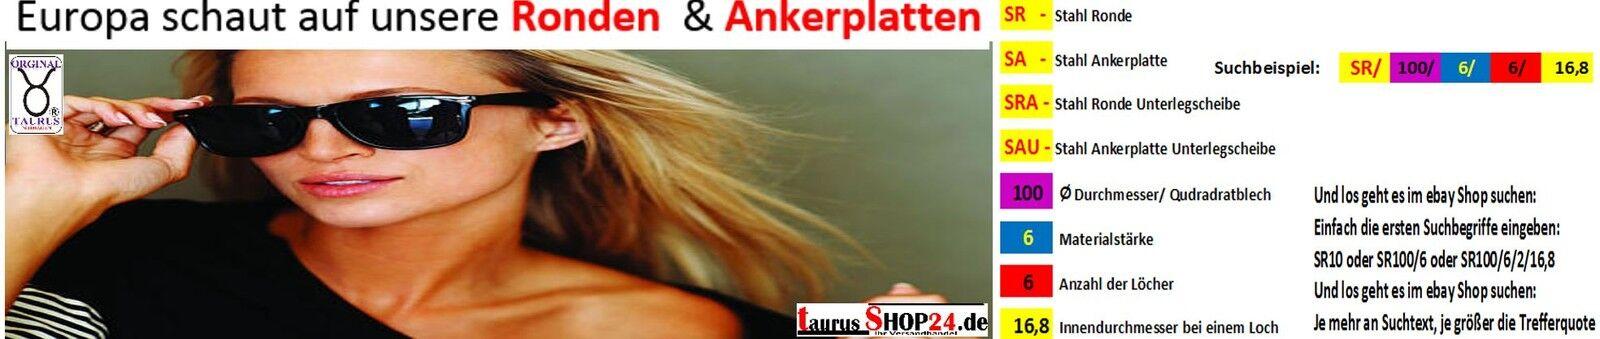 taurusshop24.de